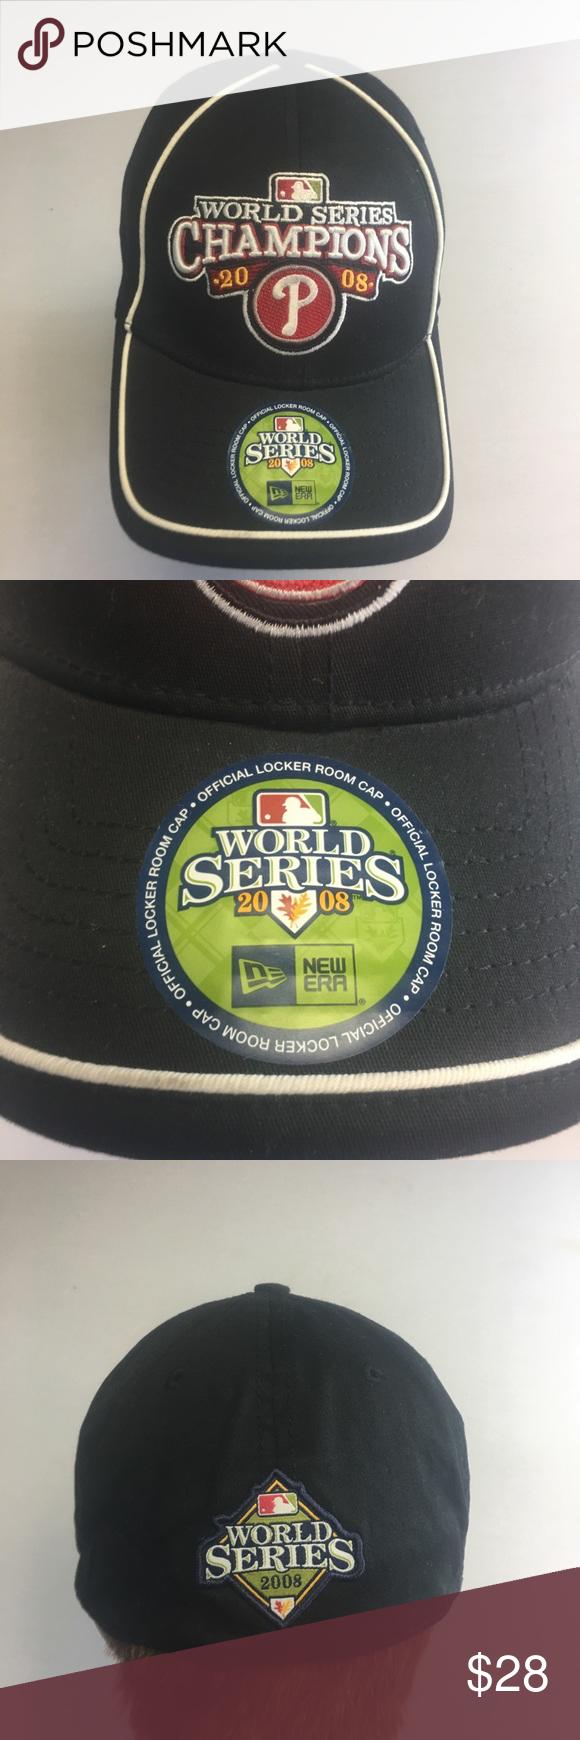 Philadelphia Phillies 2008 World Series Champs Hat New With Tags Era Mens Small Medium